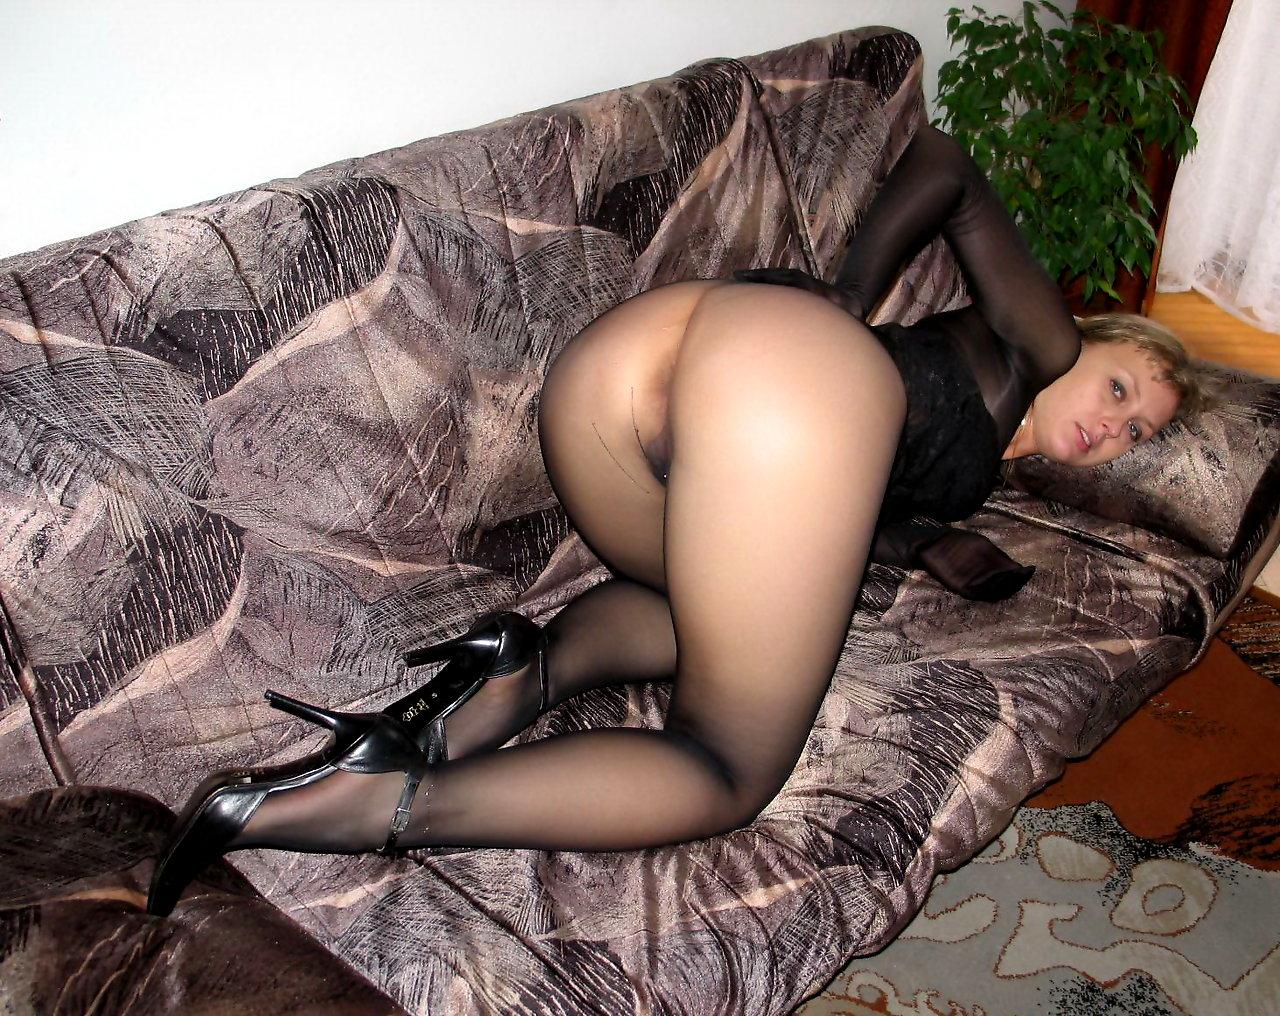 извиняюсь, но, Порно звезды трах фото подборочка спасибо!!!